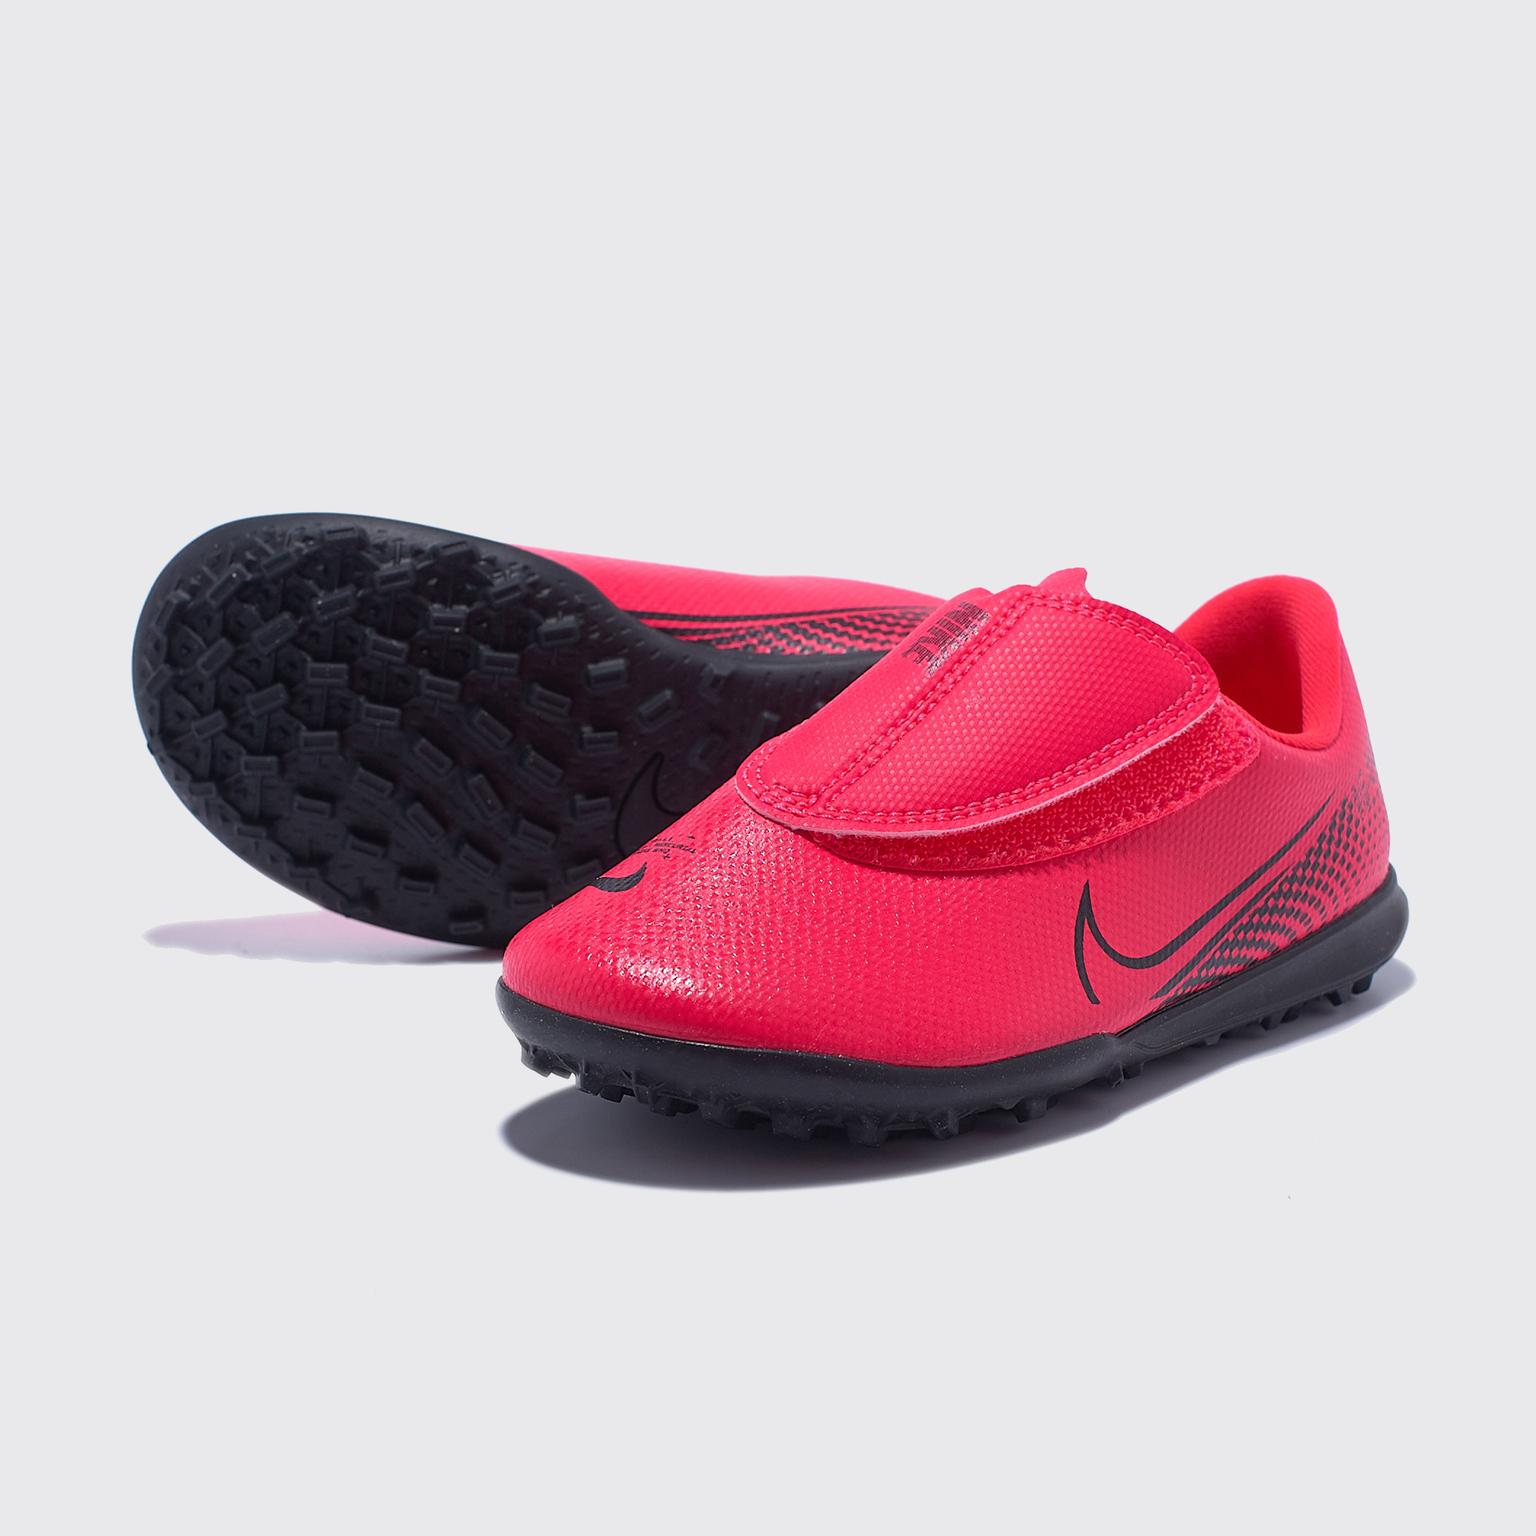 Шиповки детские Nike Vapor 13 Club TF PS (V) AT8178-606